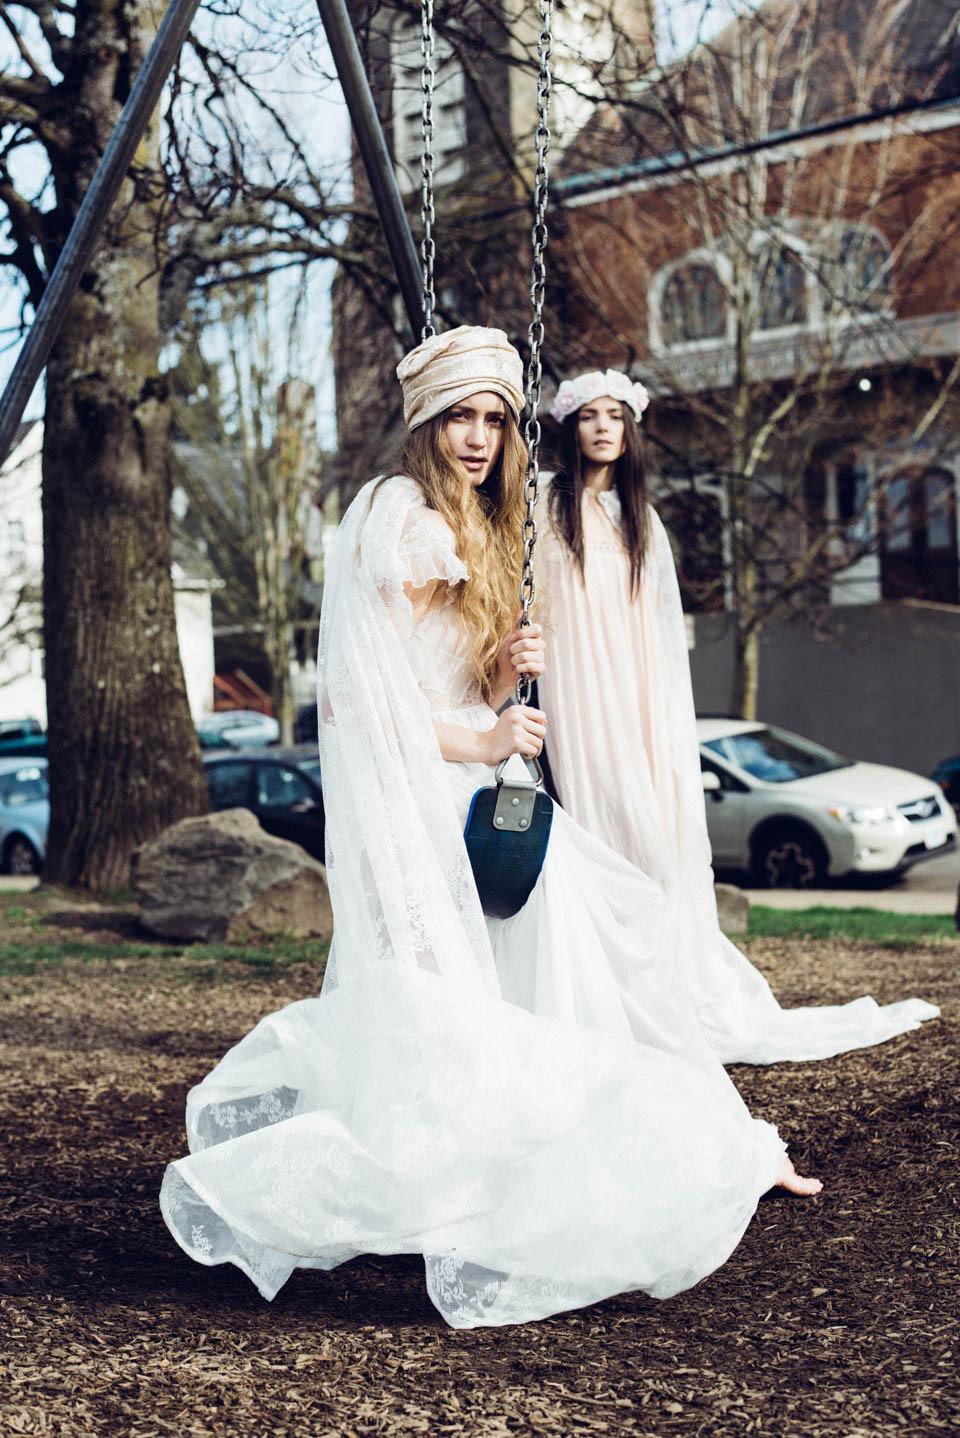 fashion editorial for jute shot in portland by fashion photographer erika astrid_53.jpg